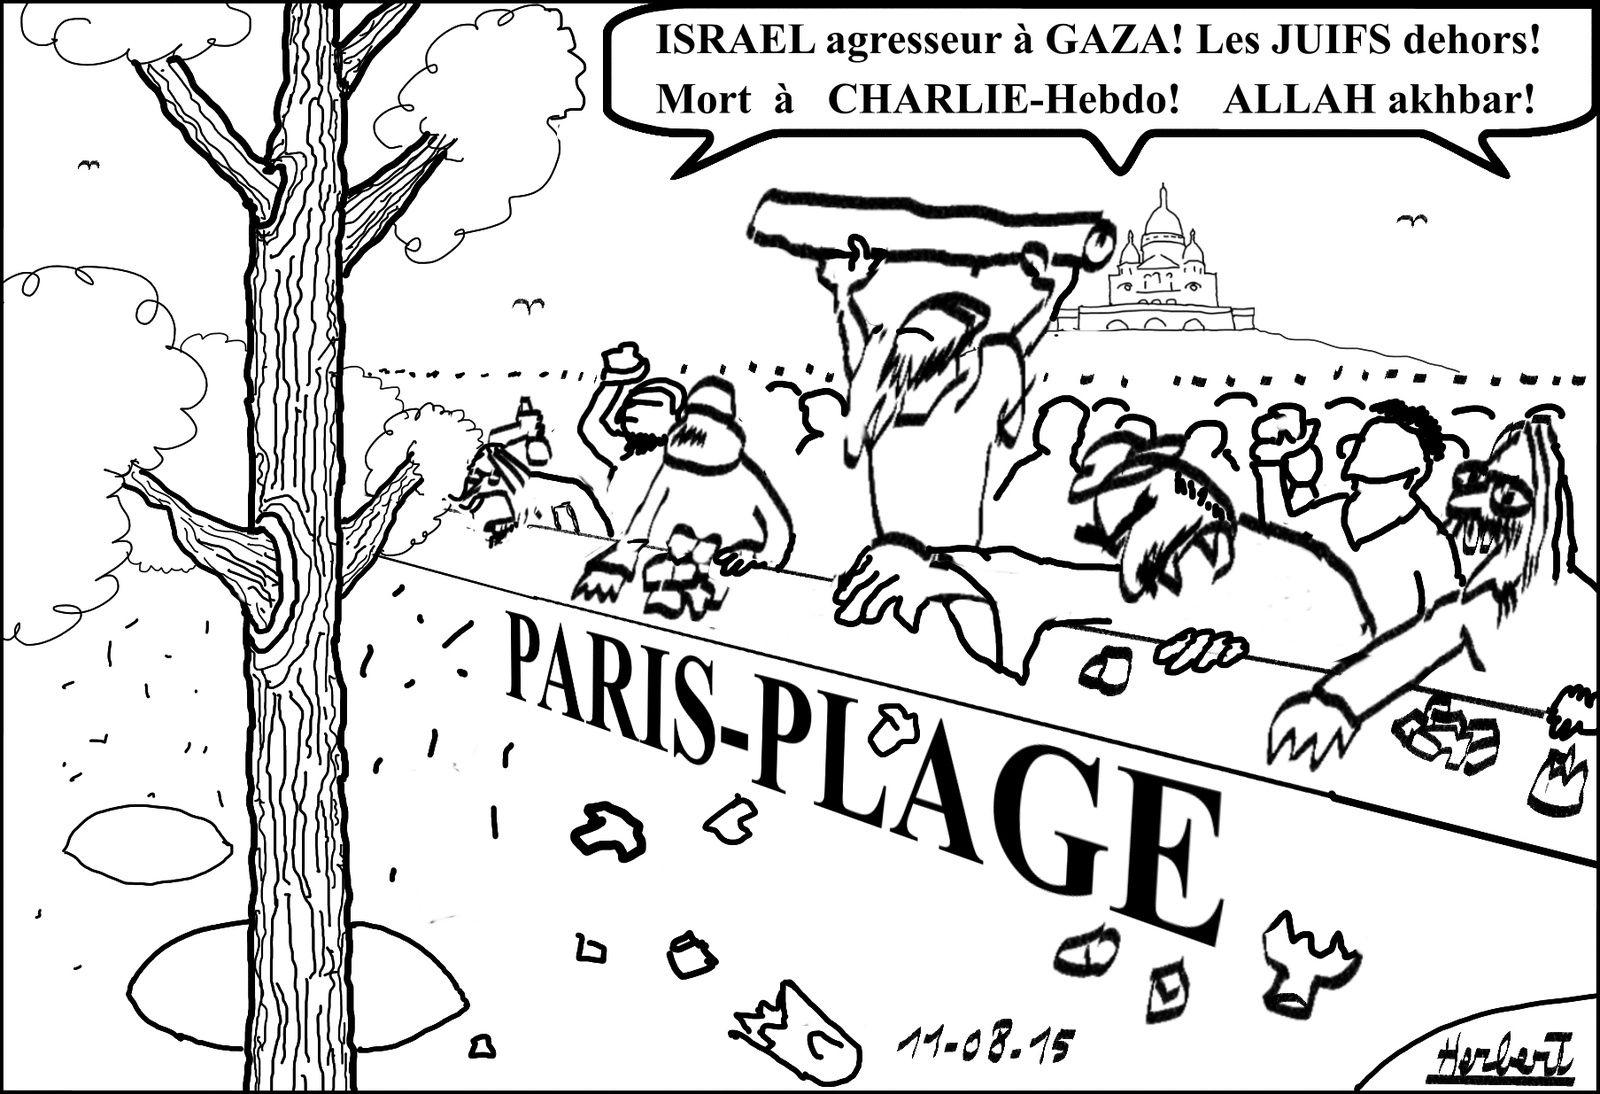 Paris-plage, hurlements islamo-gauchos